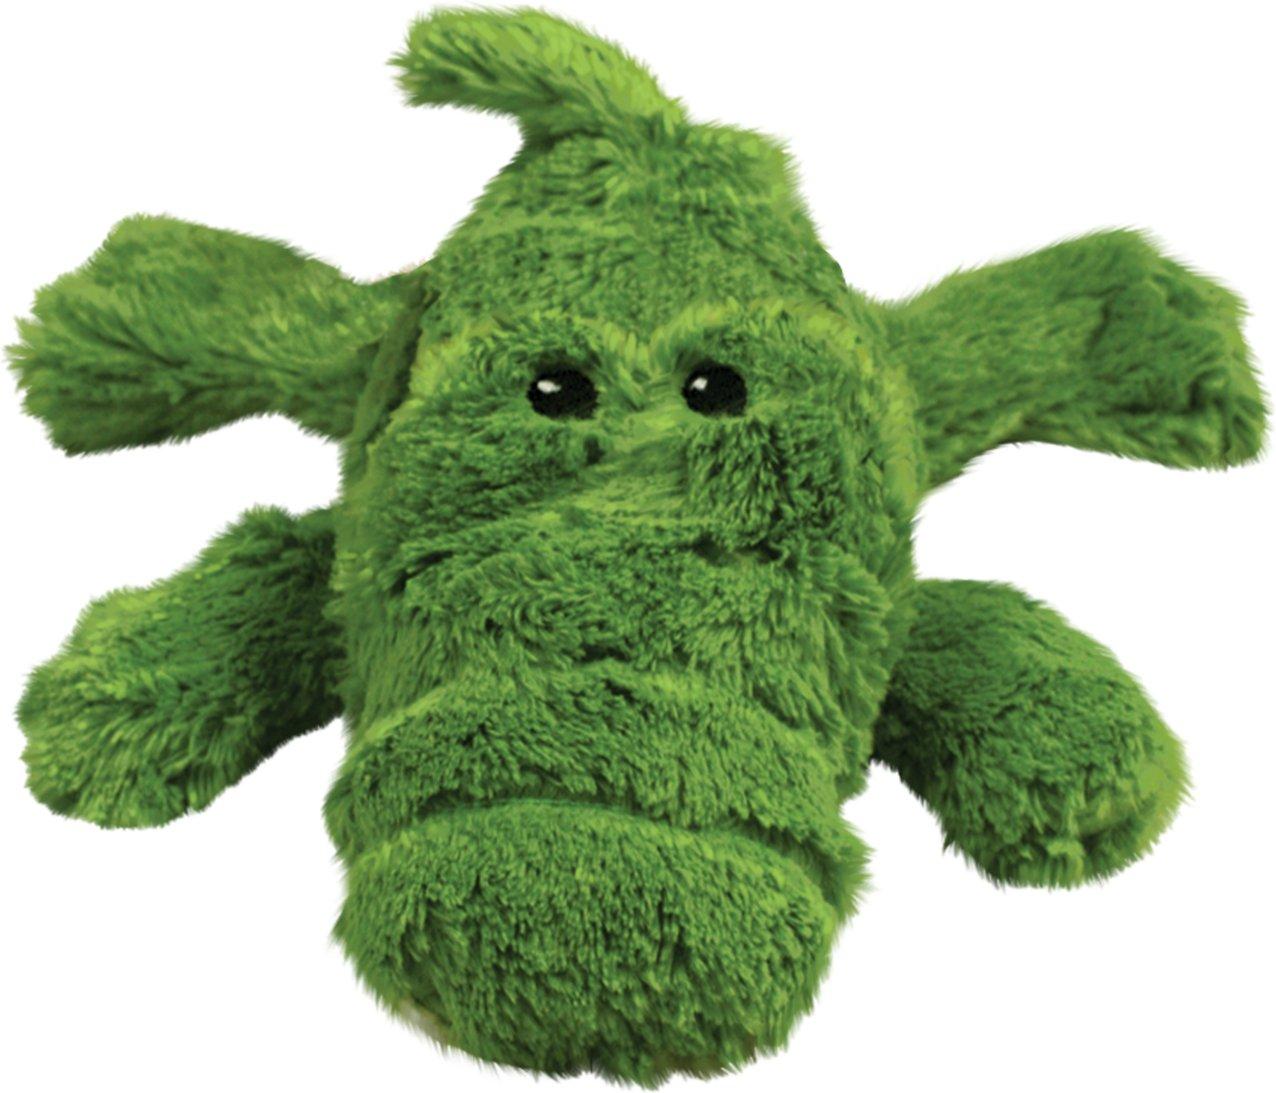 KONG Cozie Ali the Alligator Dog Toy Image